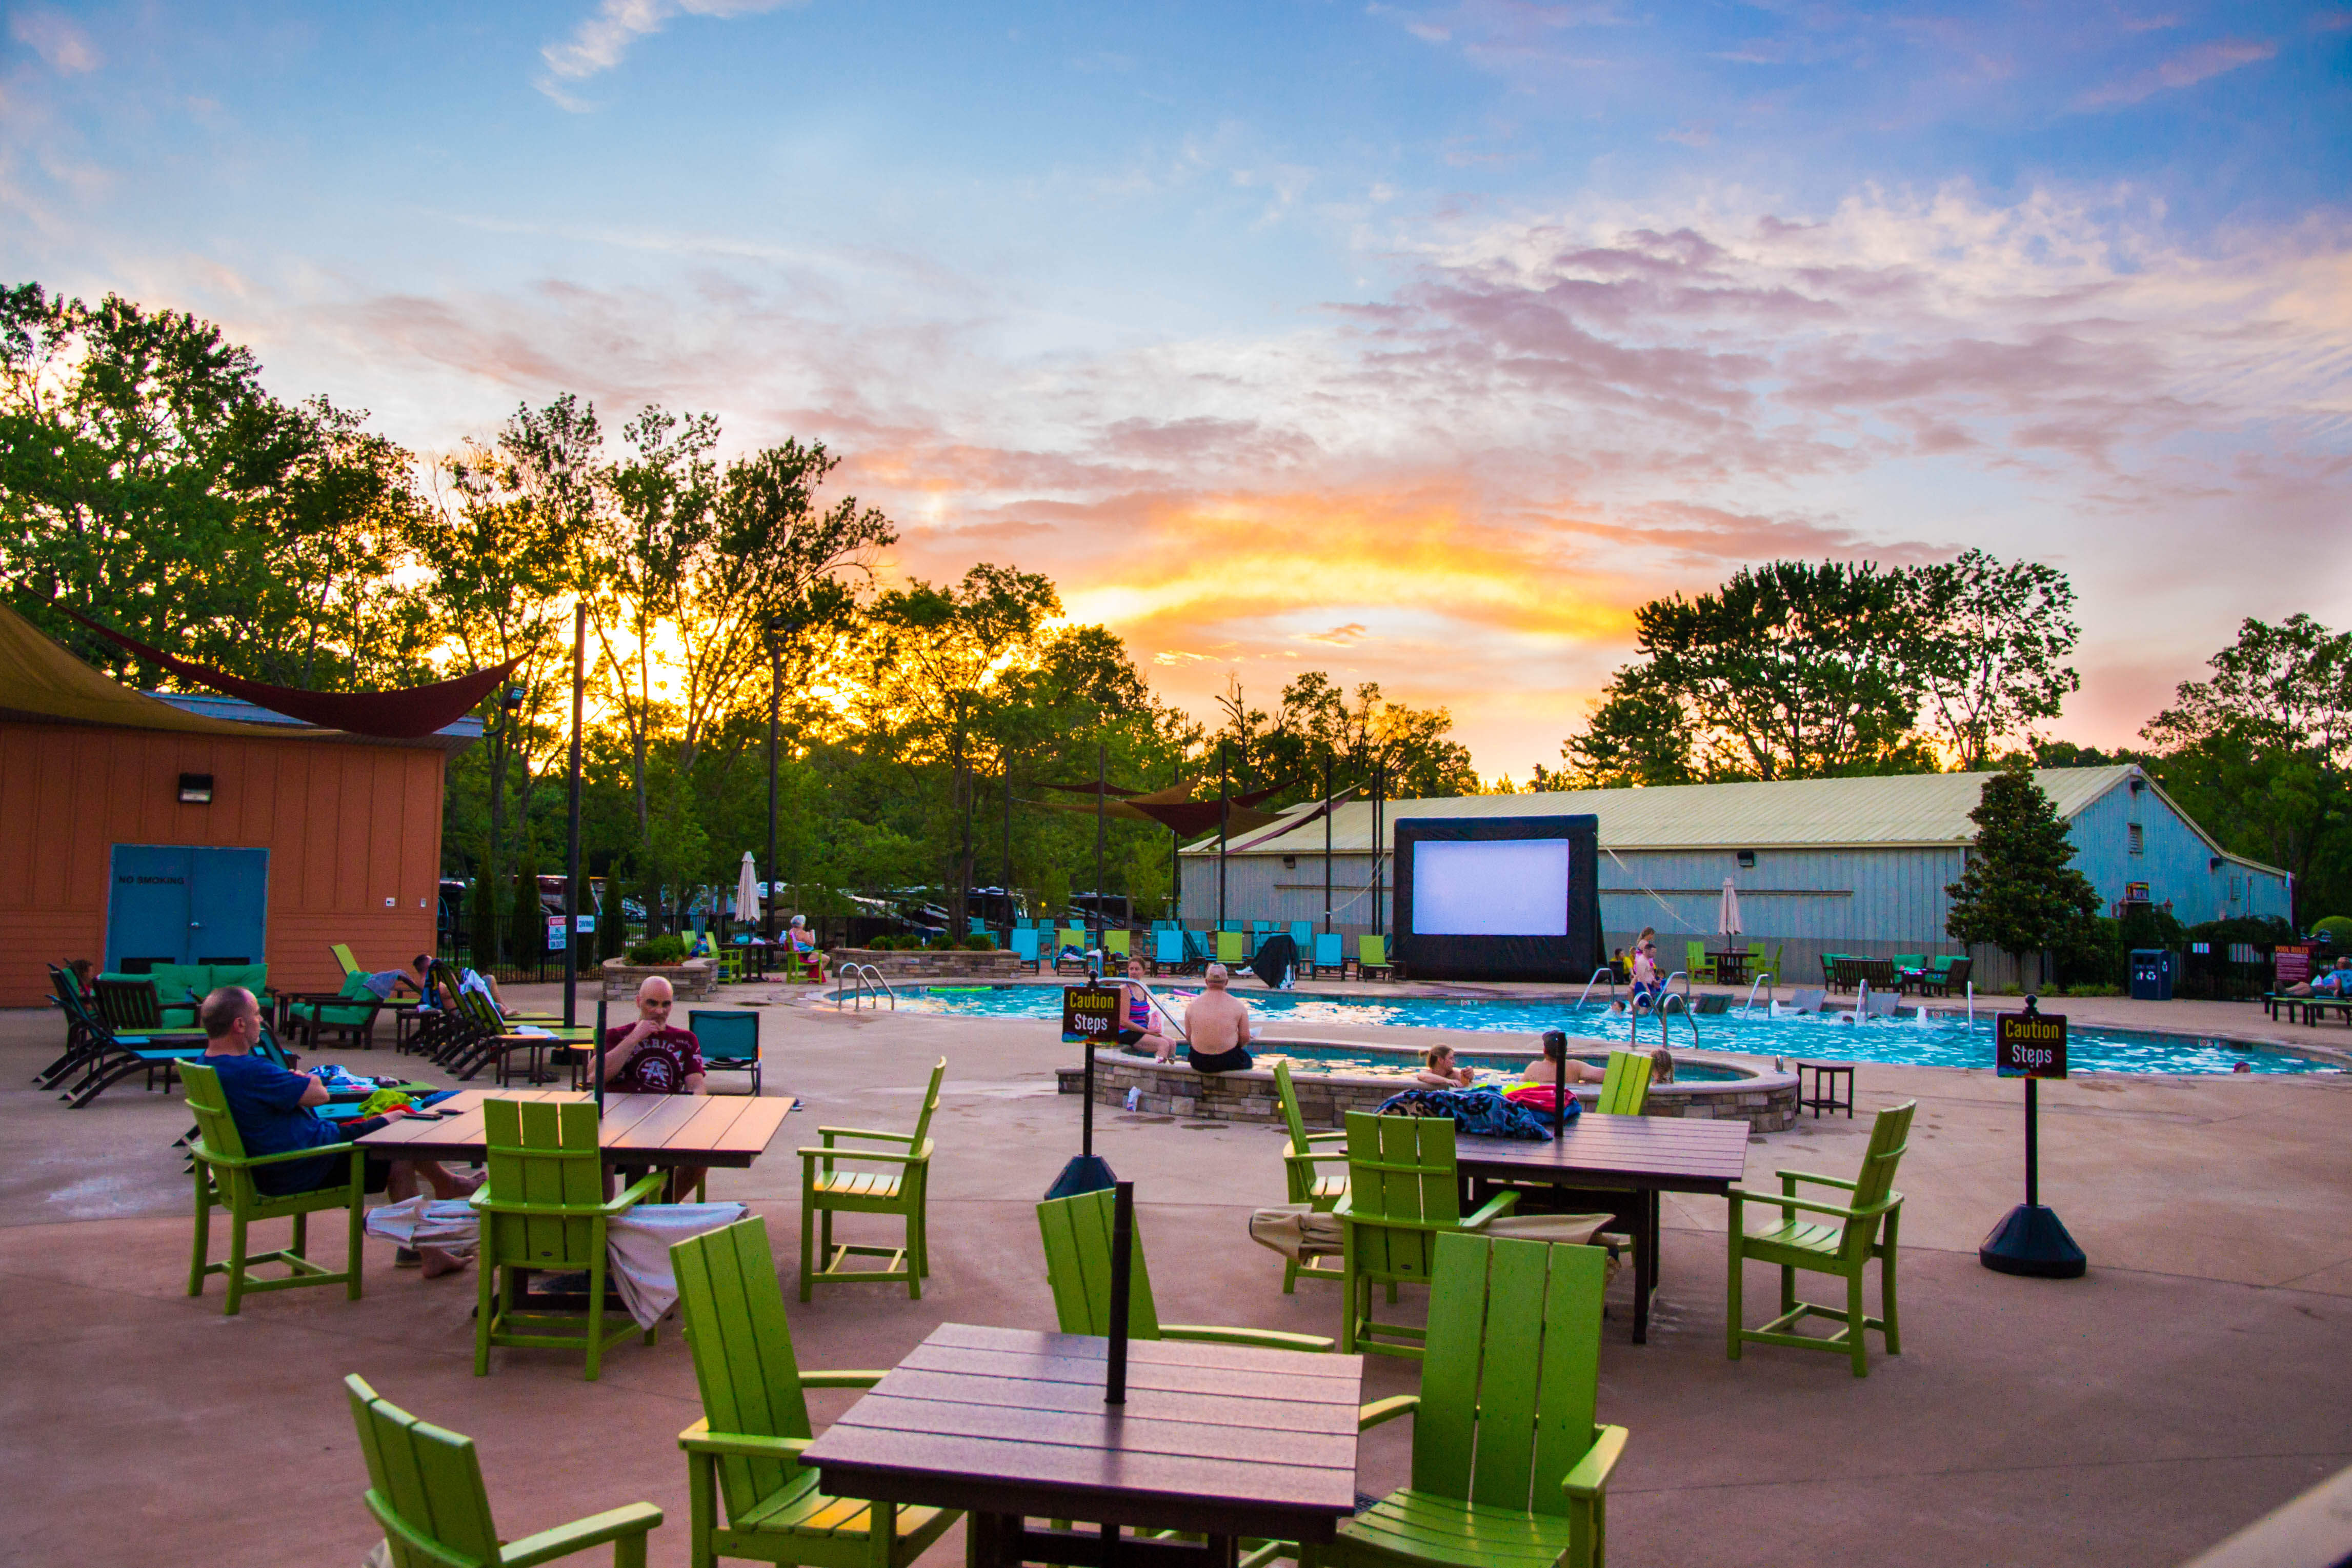 Poolside movies